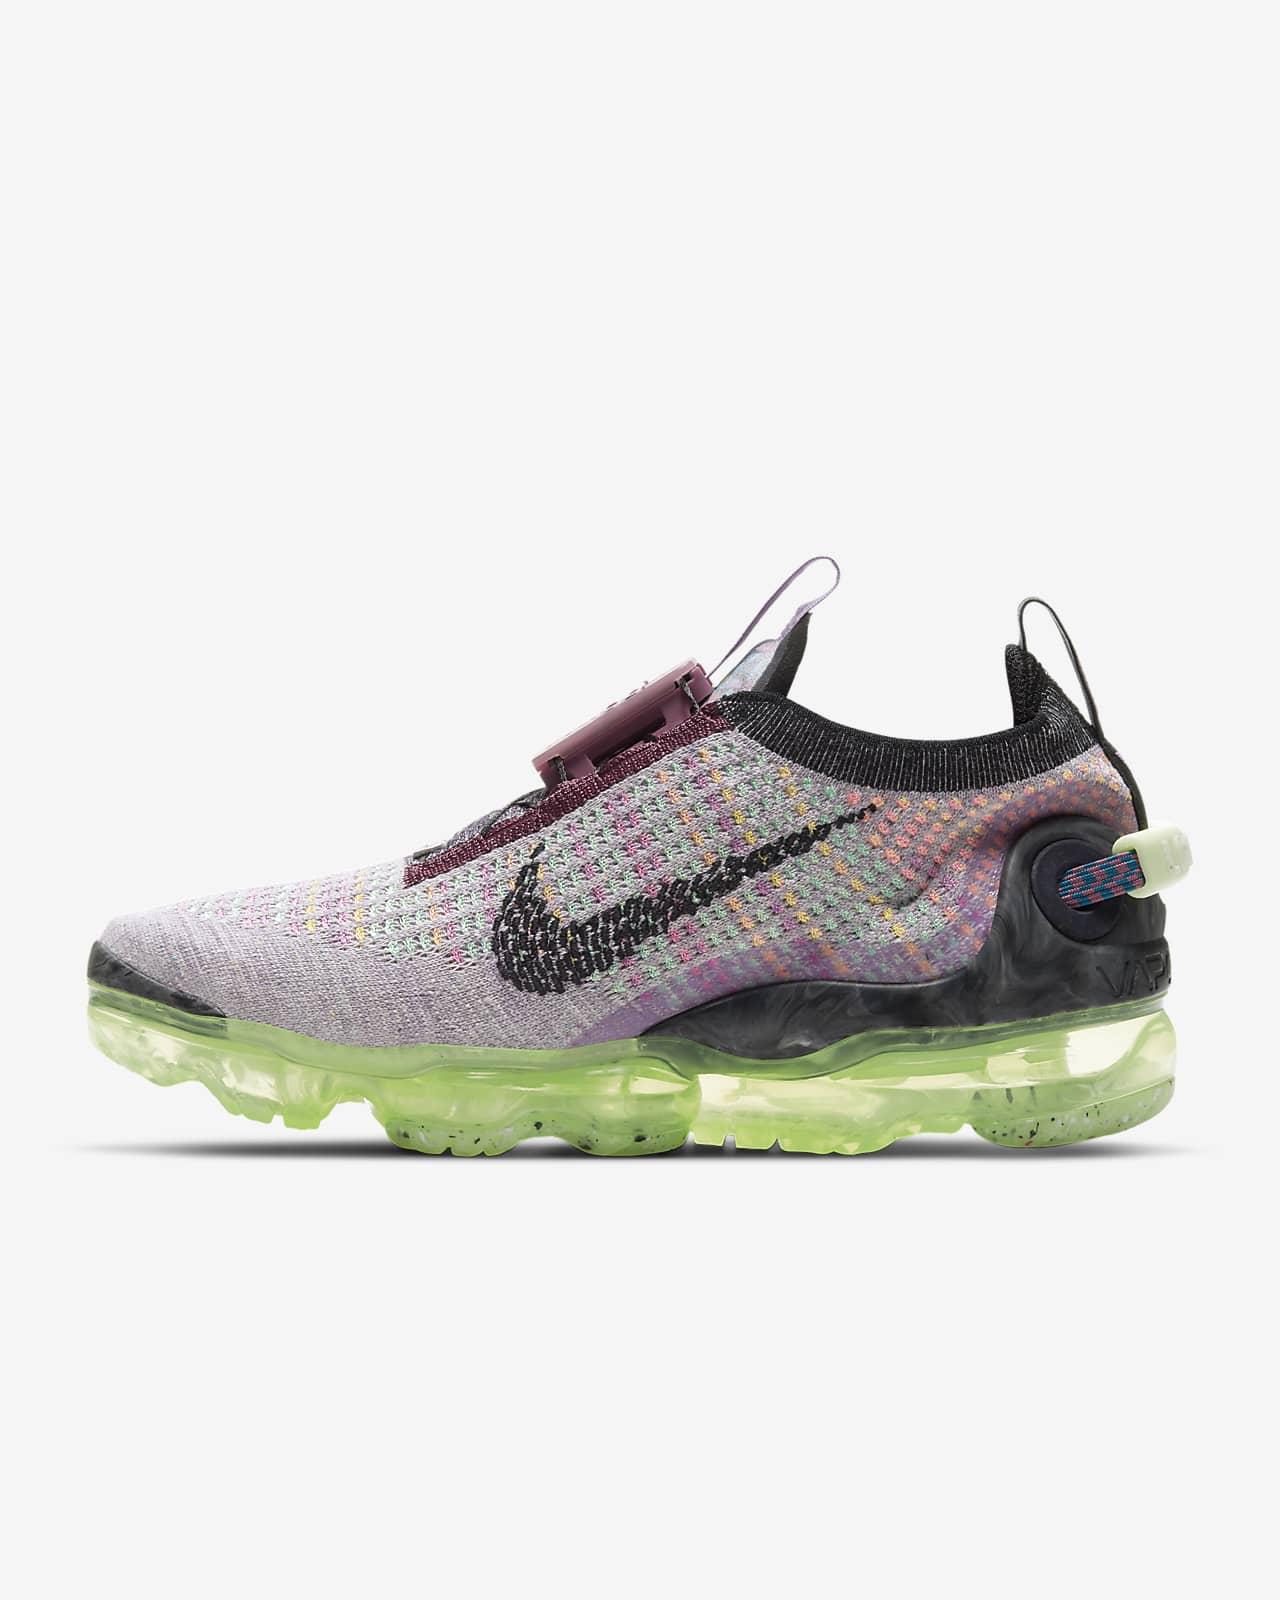 Chaussure Nike Air Vapormax 2020 FlyKnit pour Femme